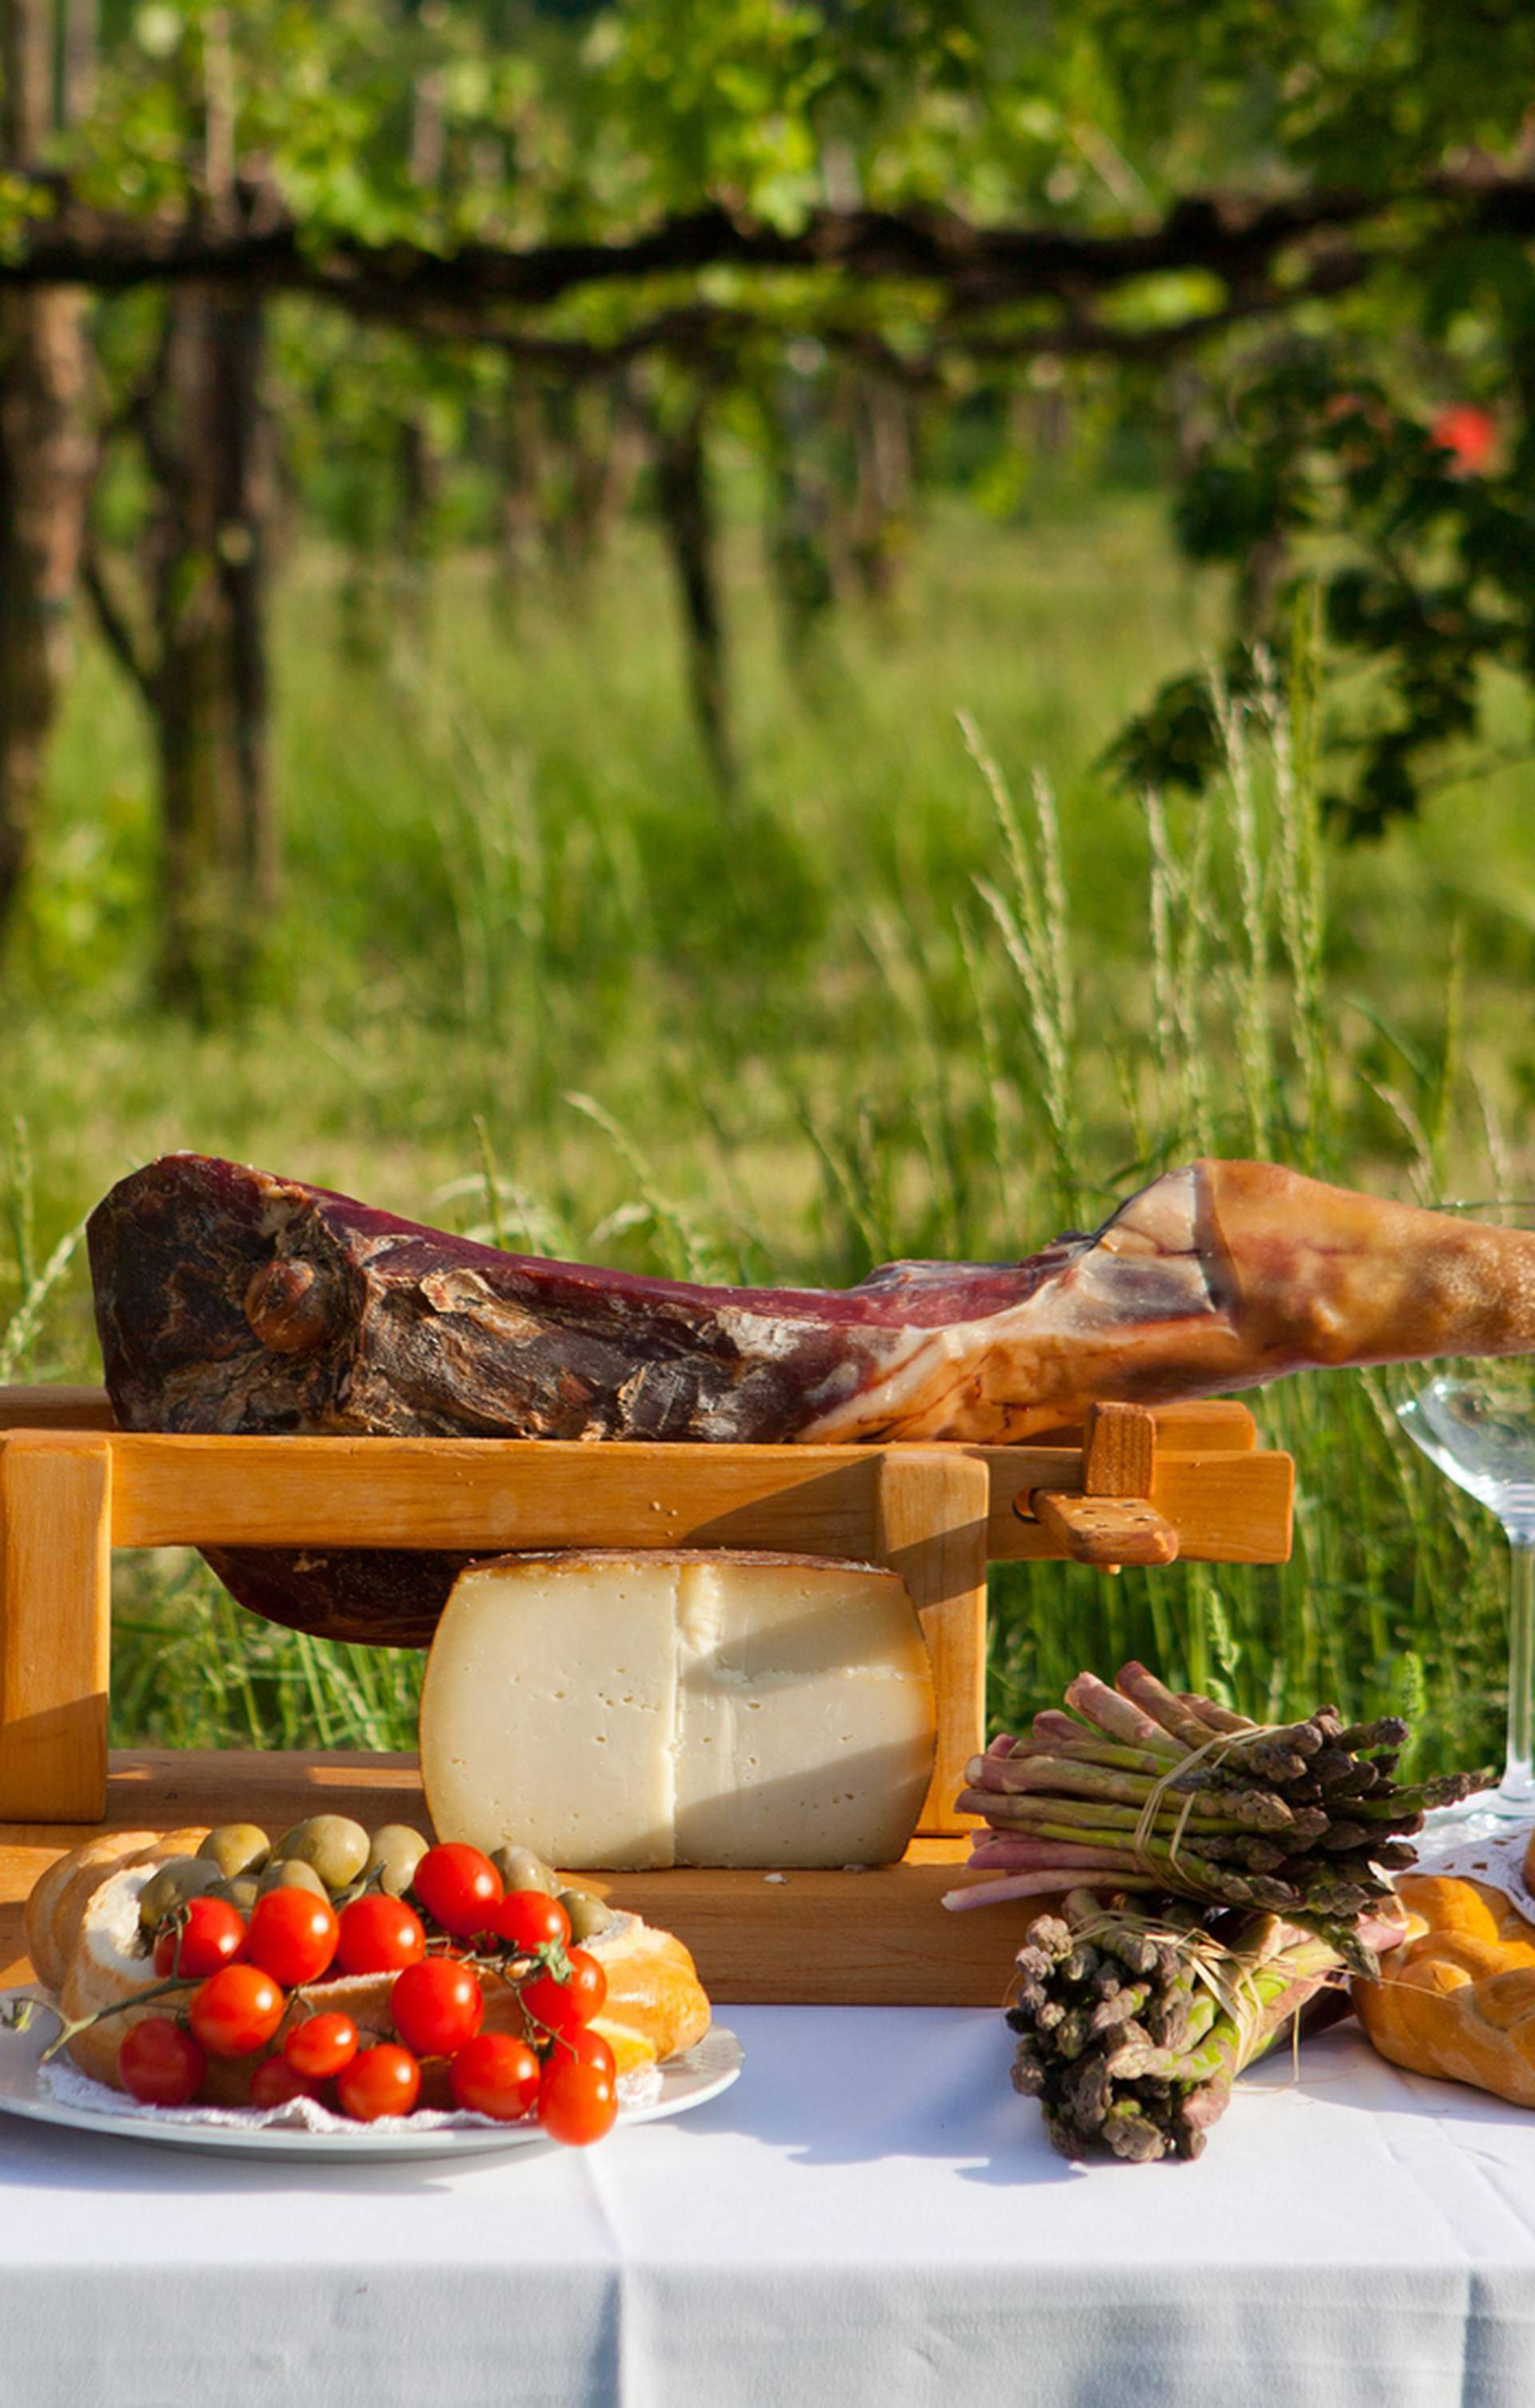 Gastro putopis: Boje, mirisi i okusi slovenskog raja na zemlji